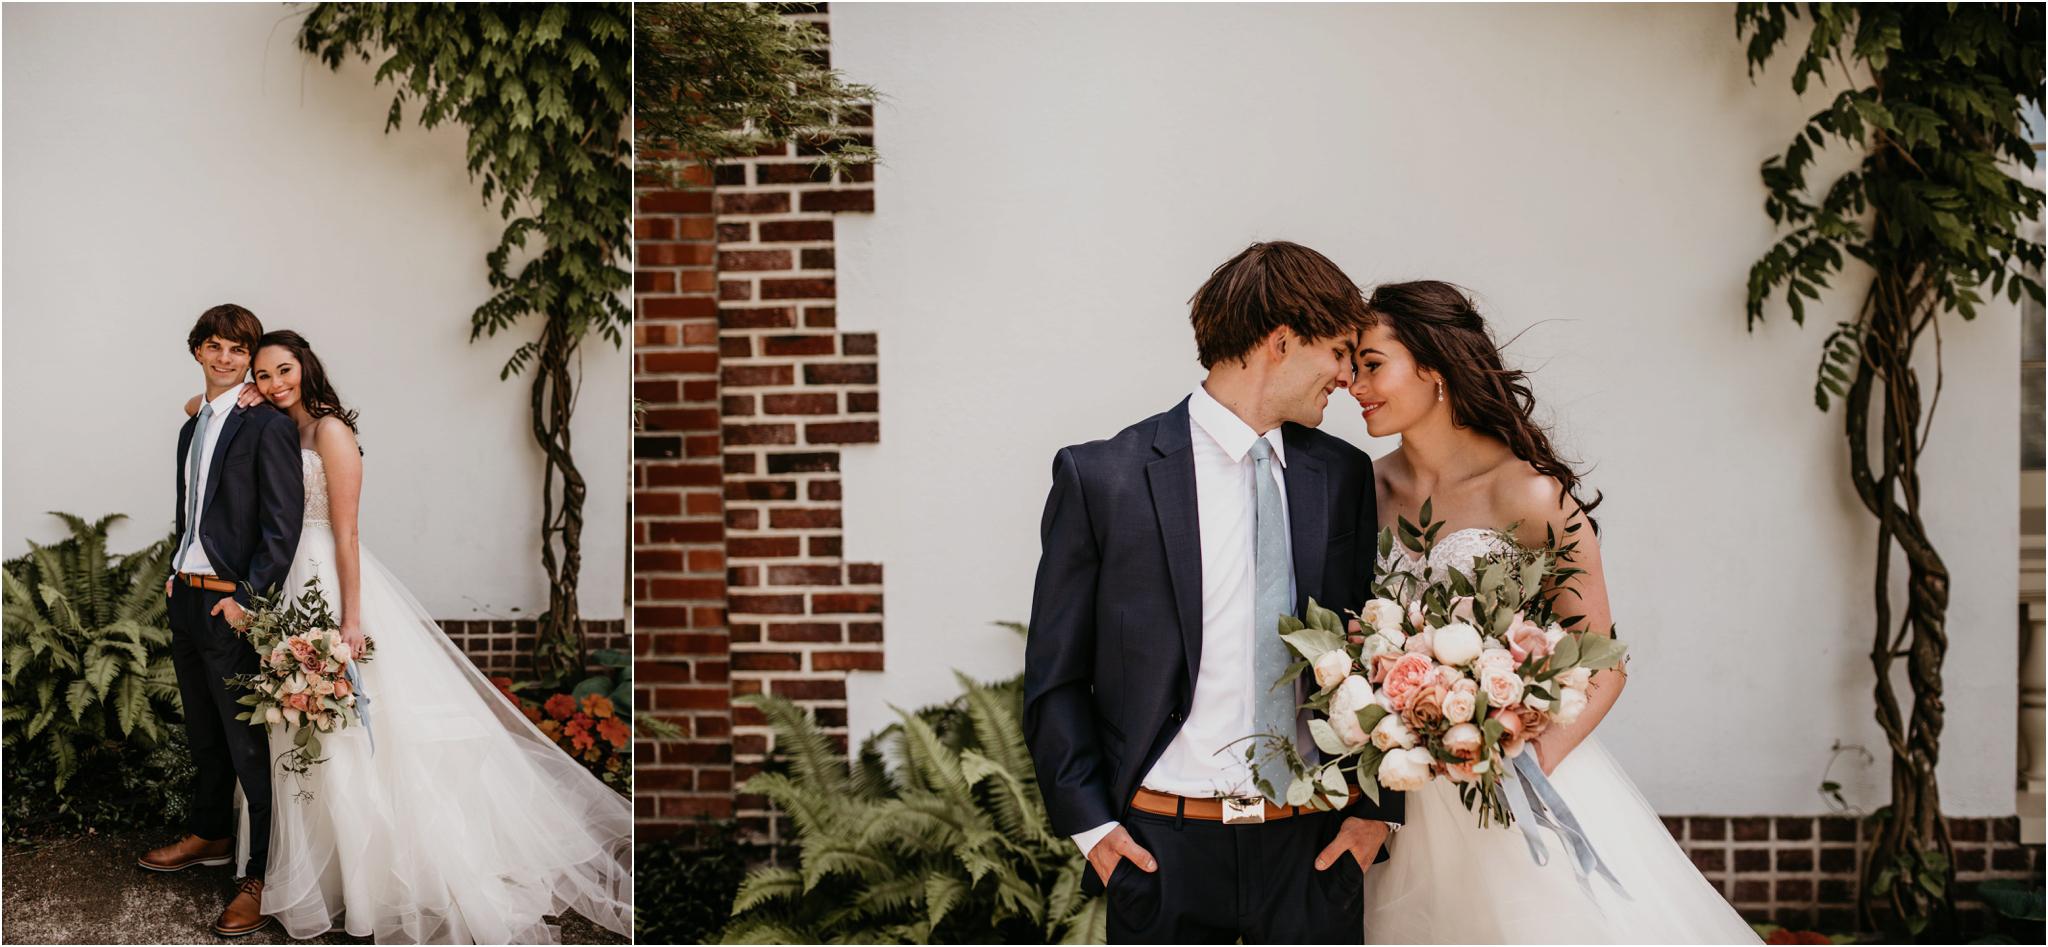 chance-and-ondrea-lairmont-manor-wedding-seattle-photographer-041.jpg